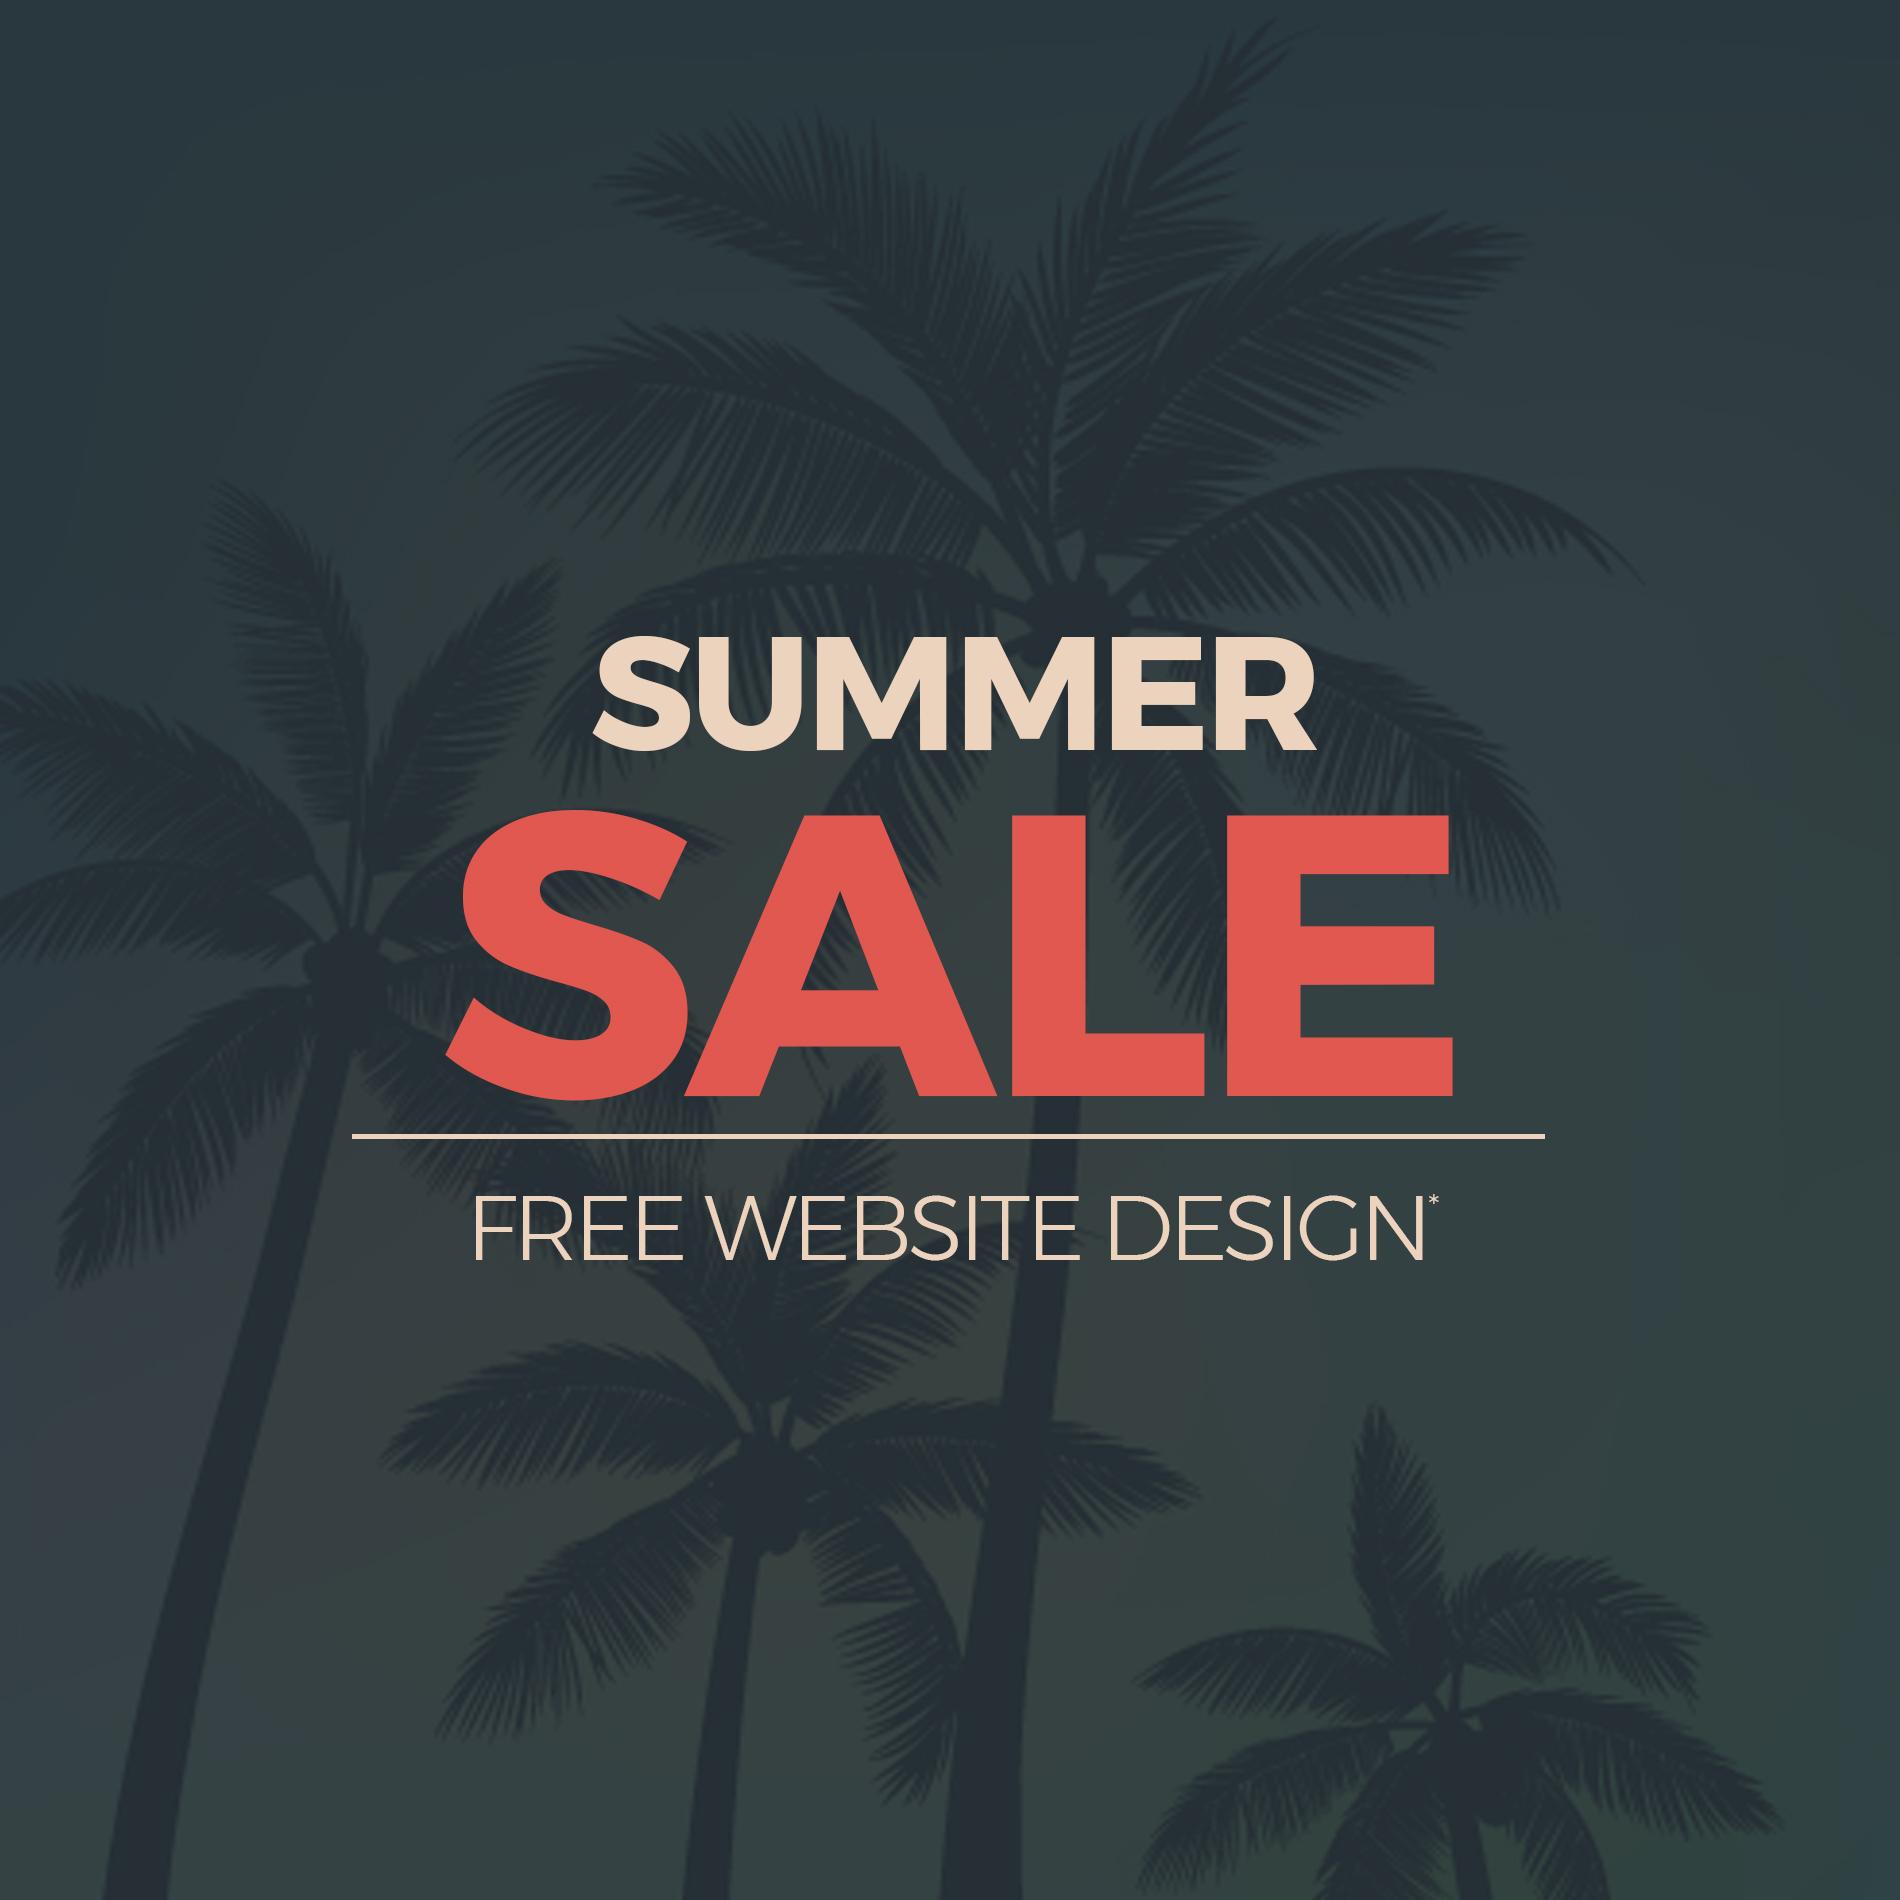 Summer Sale Free Website Design